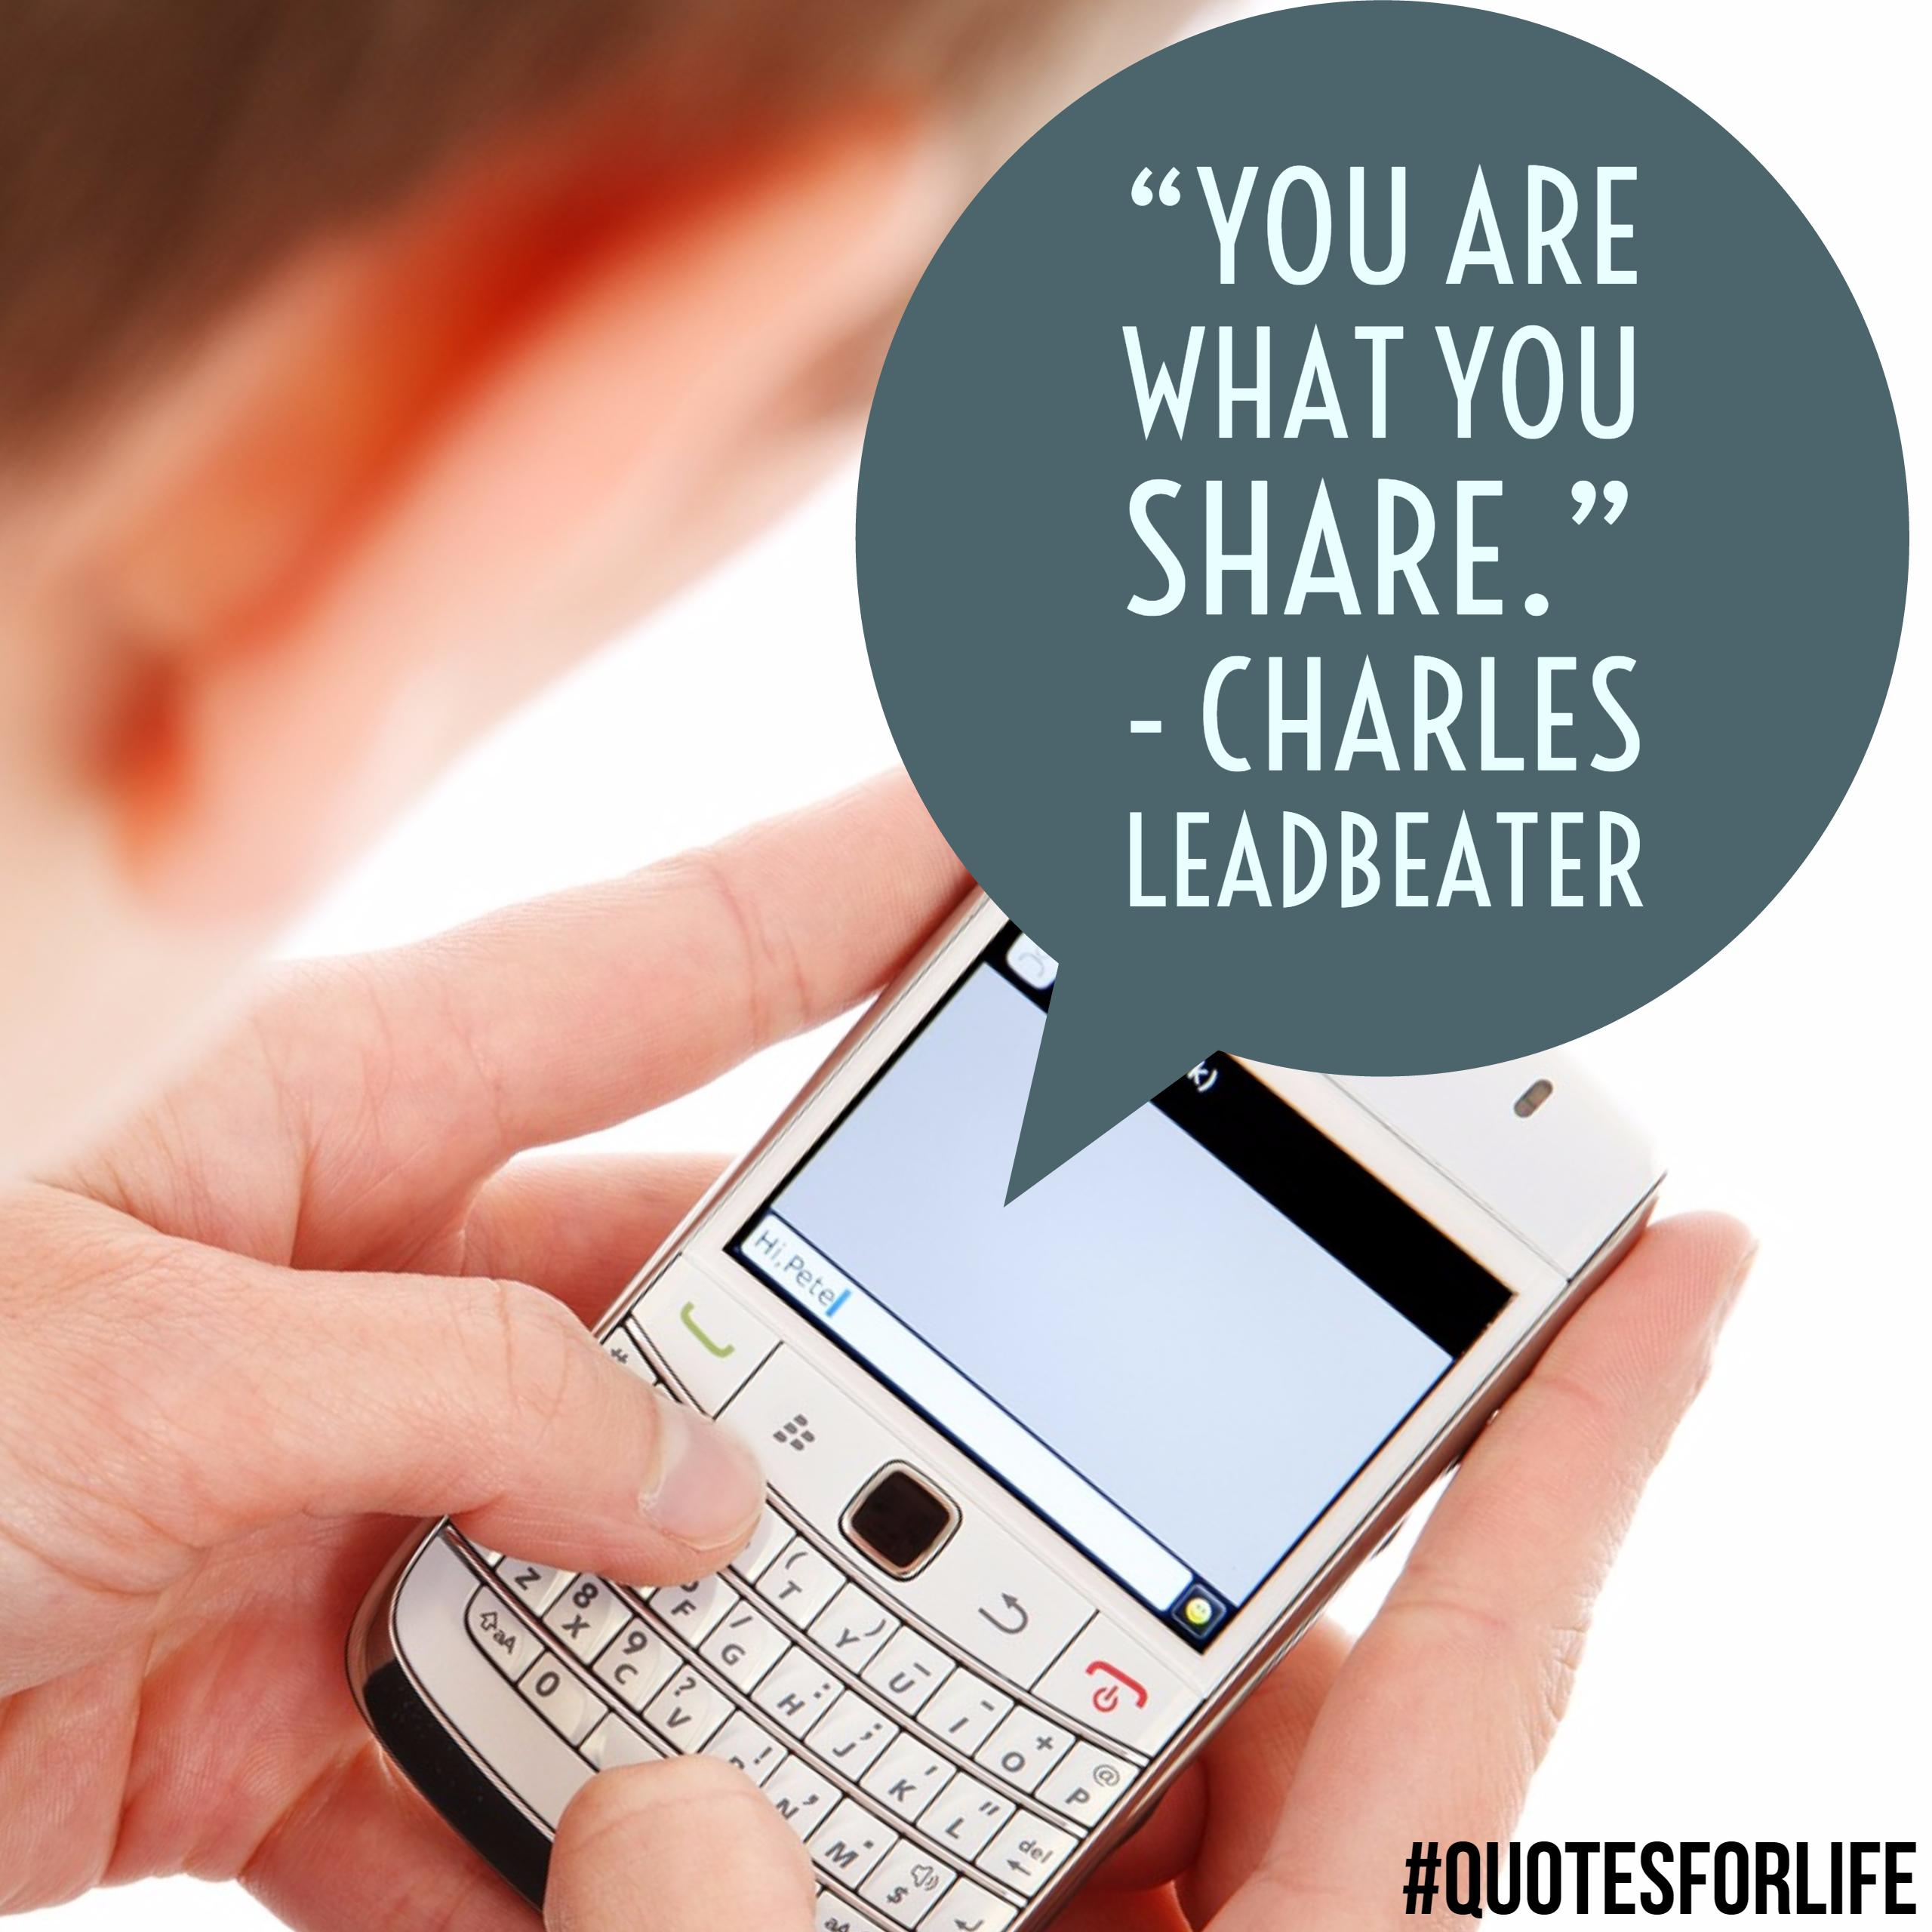 Charles Leadbeater